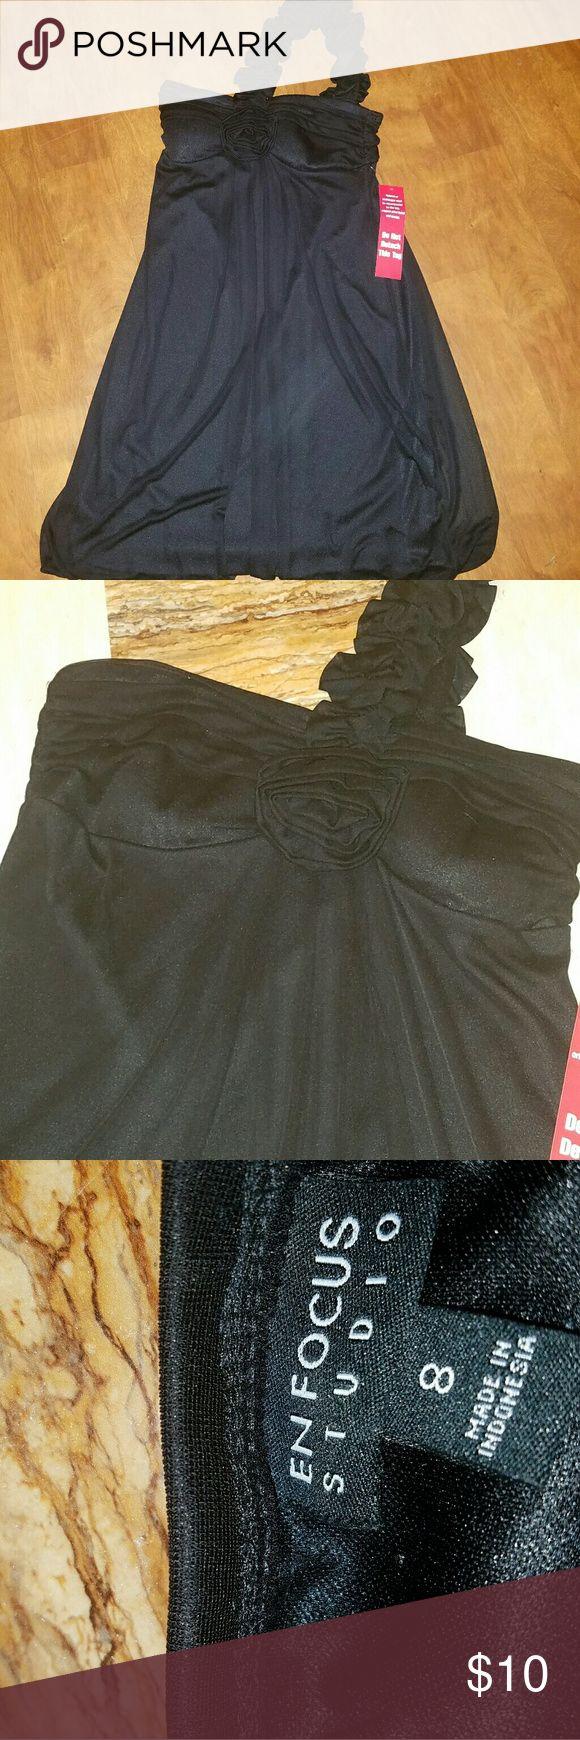 Women Size 8 black evening short dress one strap Size 8 short black eveing dress short one shoulder strap Dresses One Shoulder